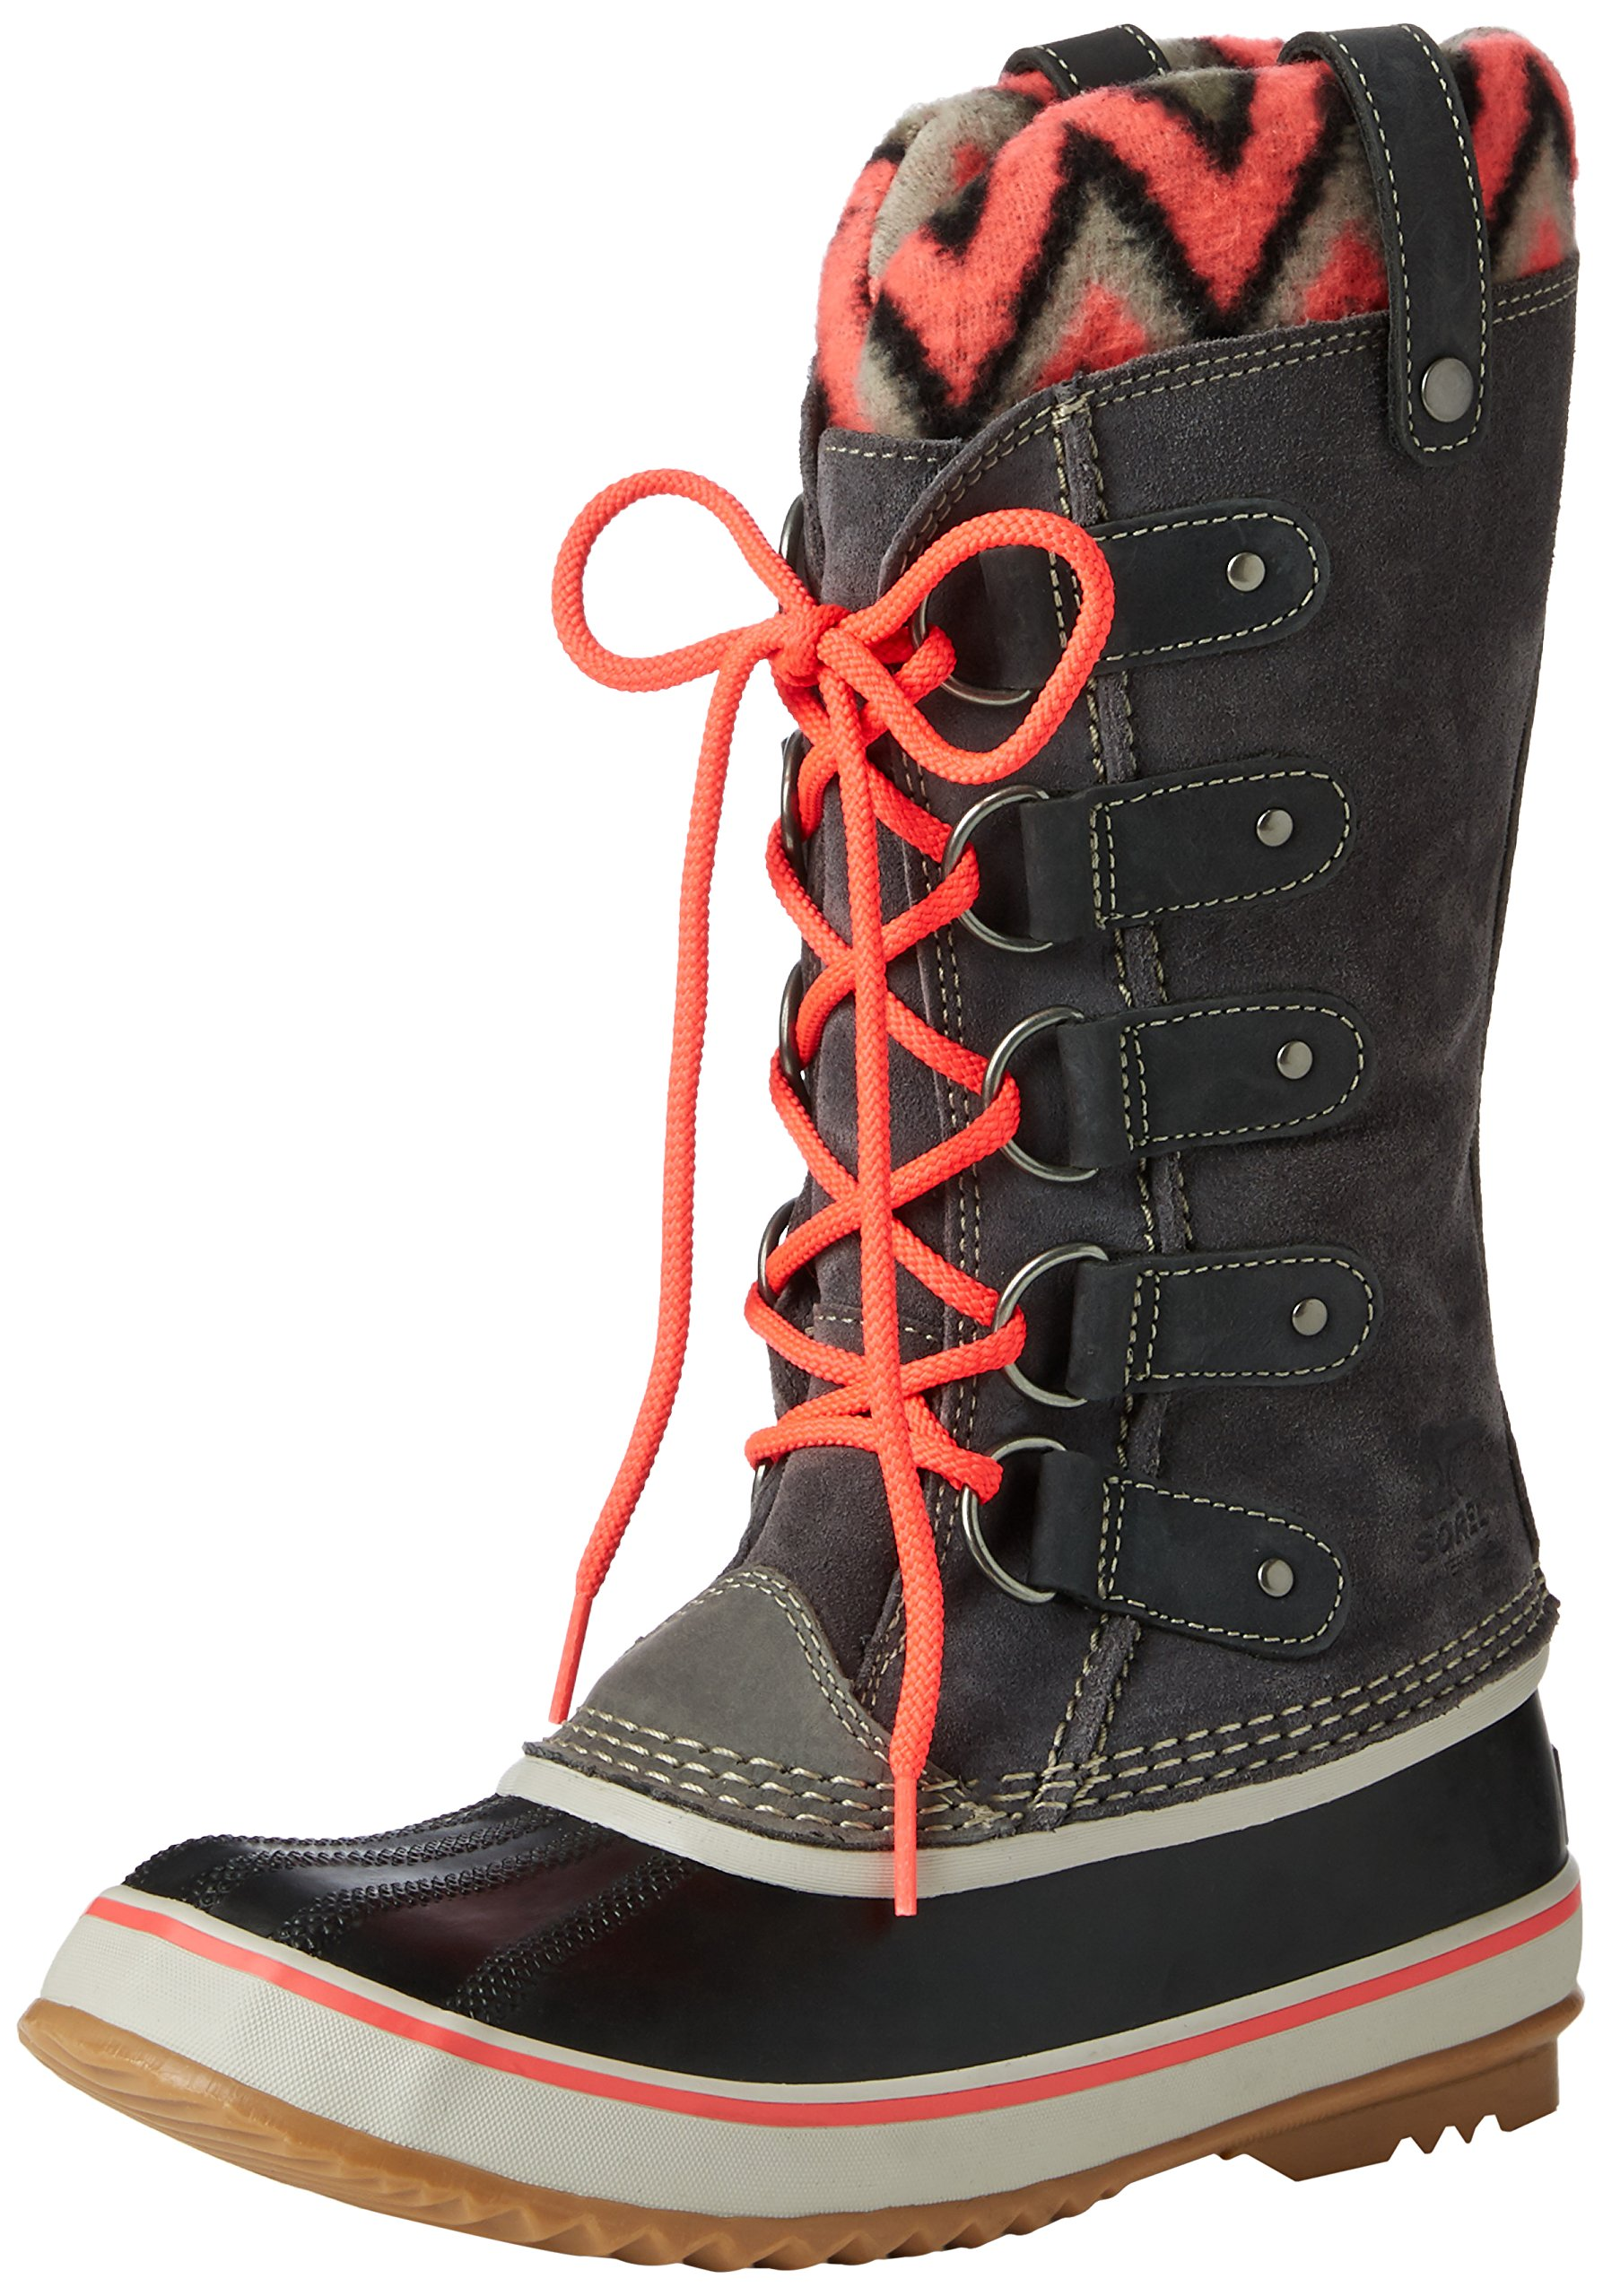 Sorel Womens Joan of Arctic Knit II Snow Boot Shale Size 7